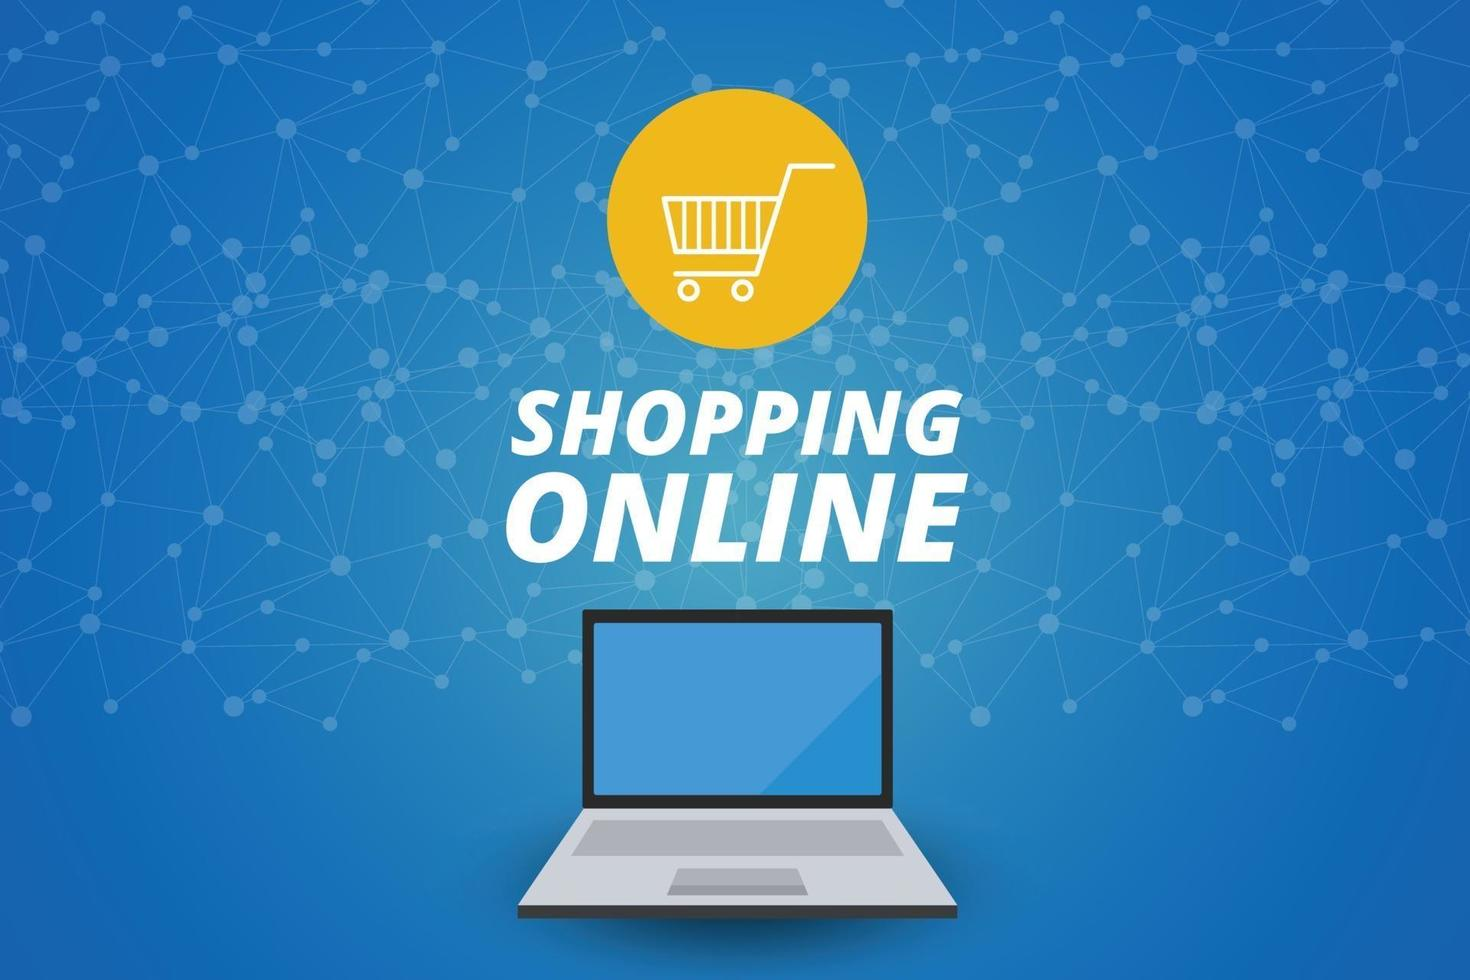 Online-Shopping auf Website, Marketingkonzept, Vektordesign. vektor